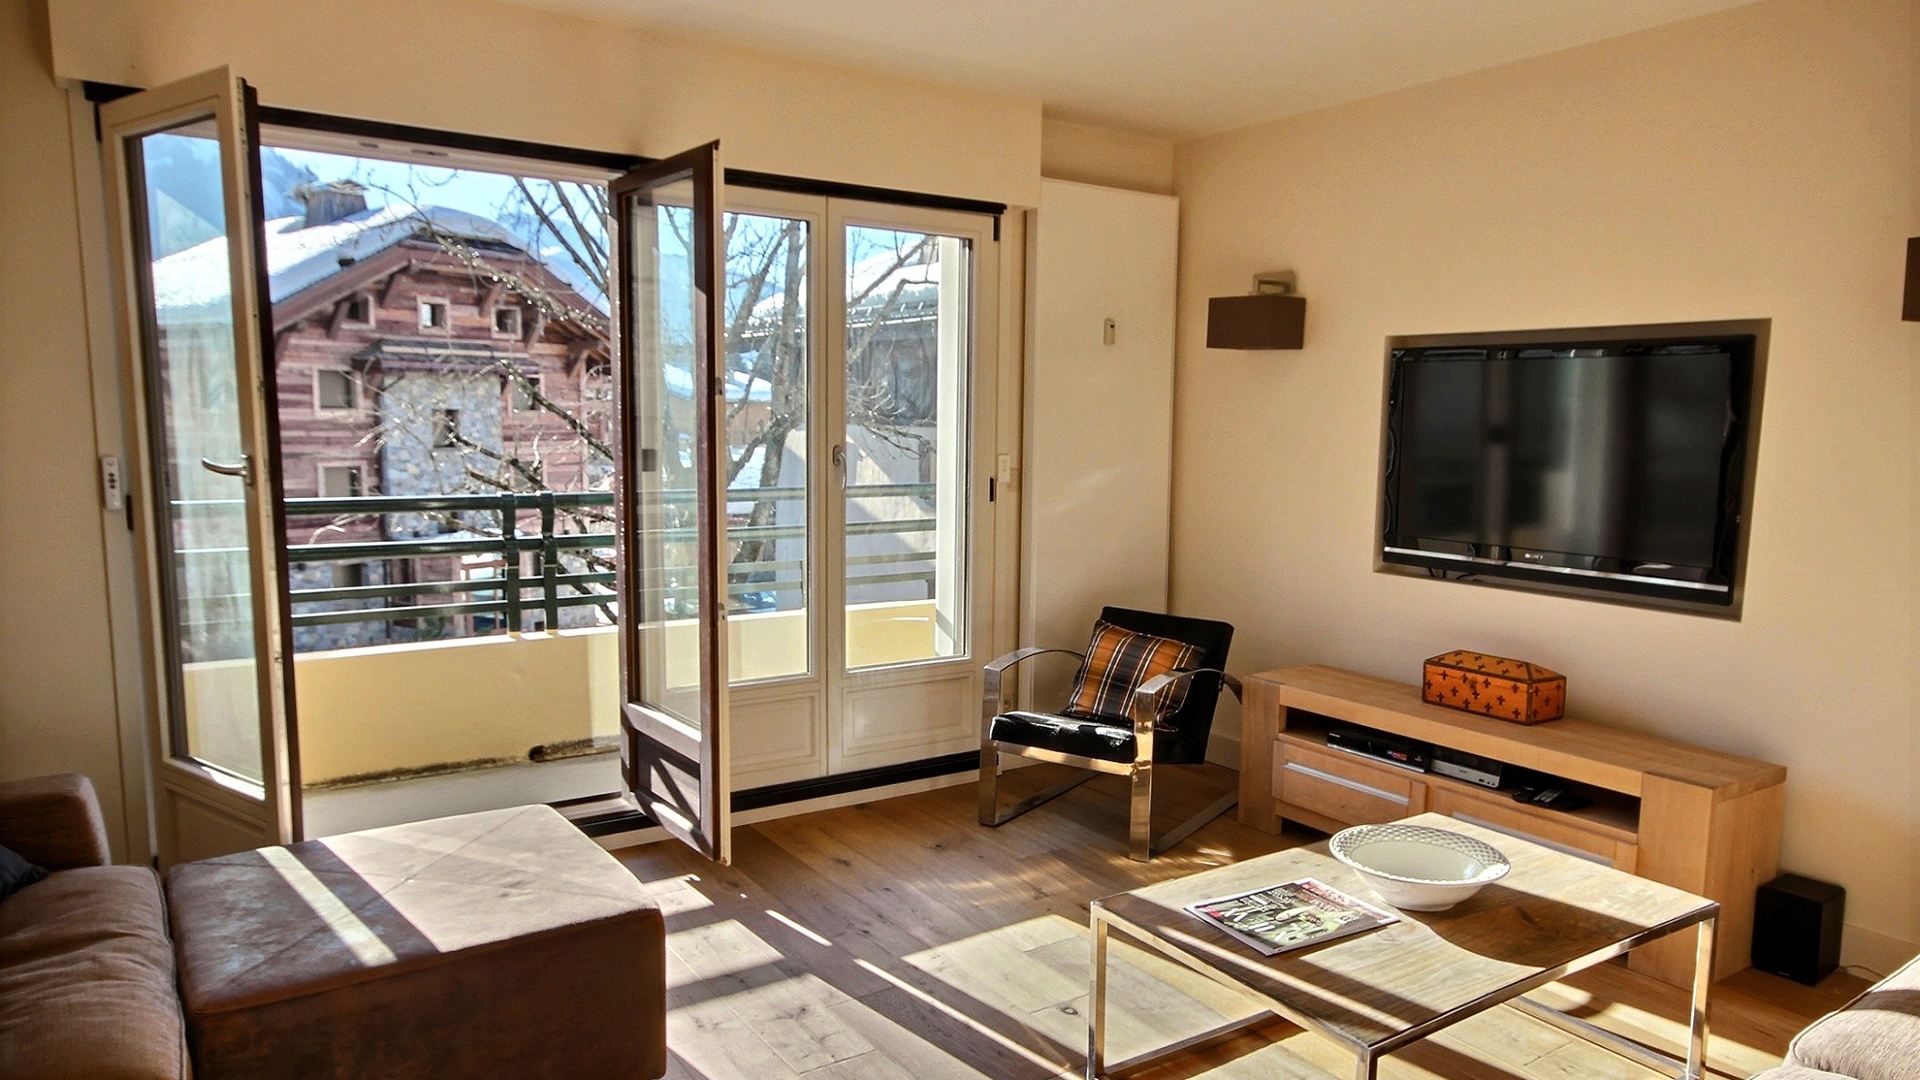 Luna Apt Apartments, France